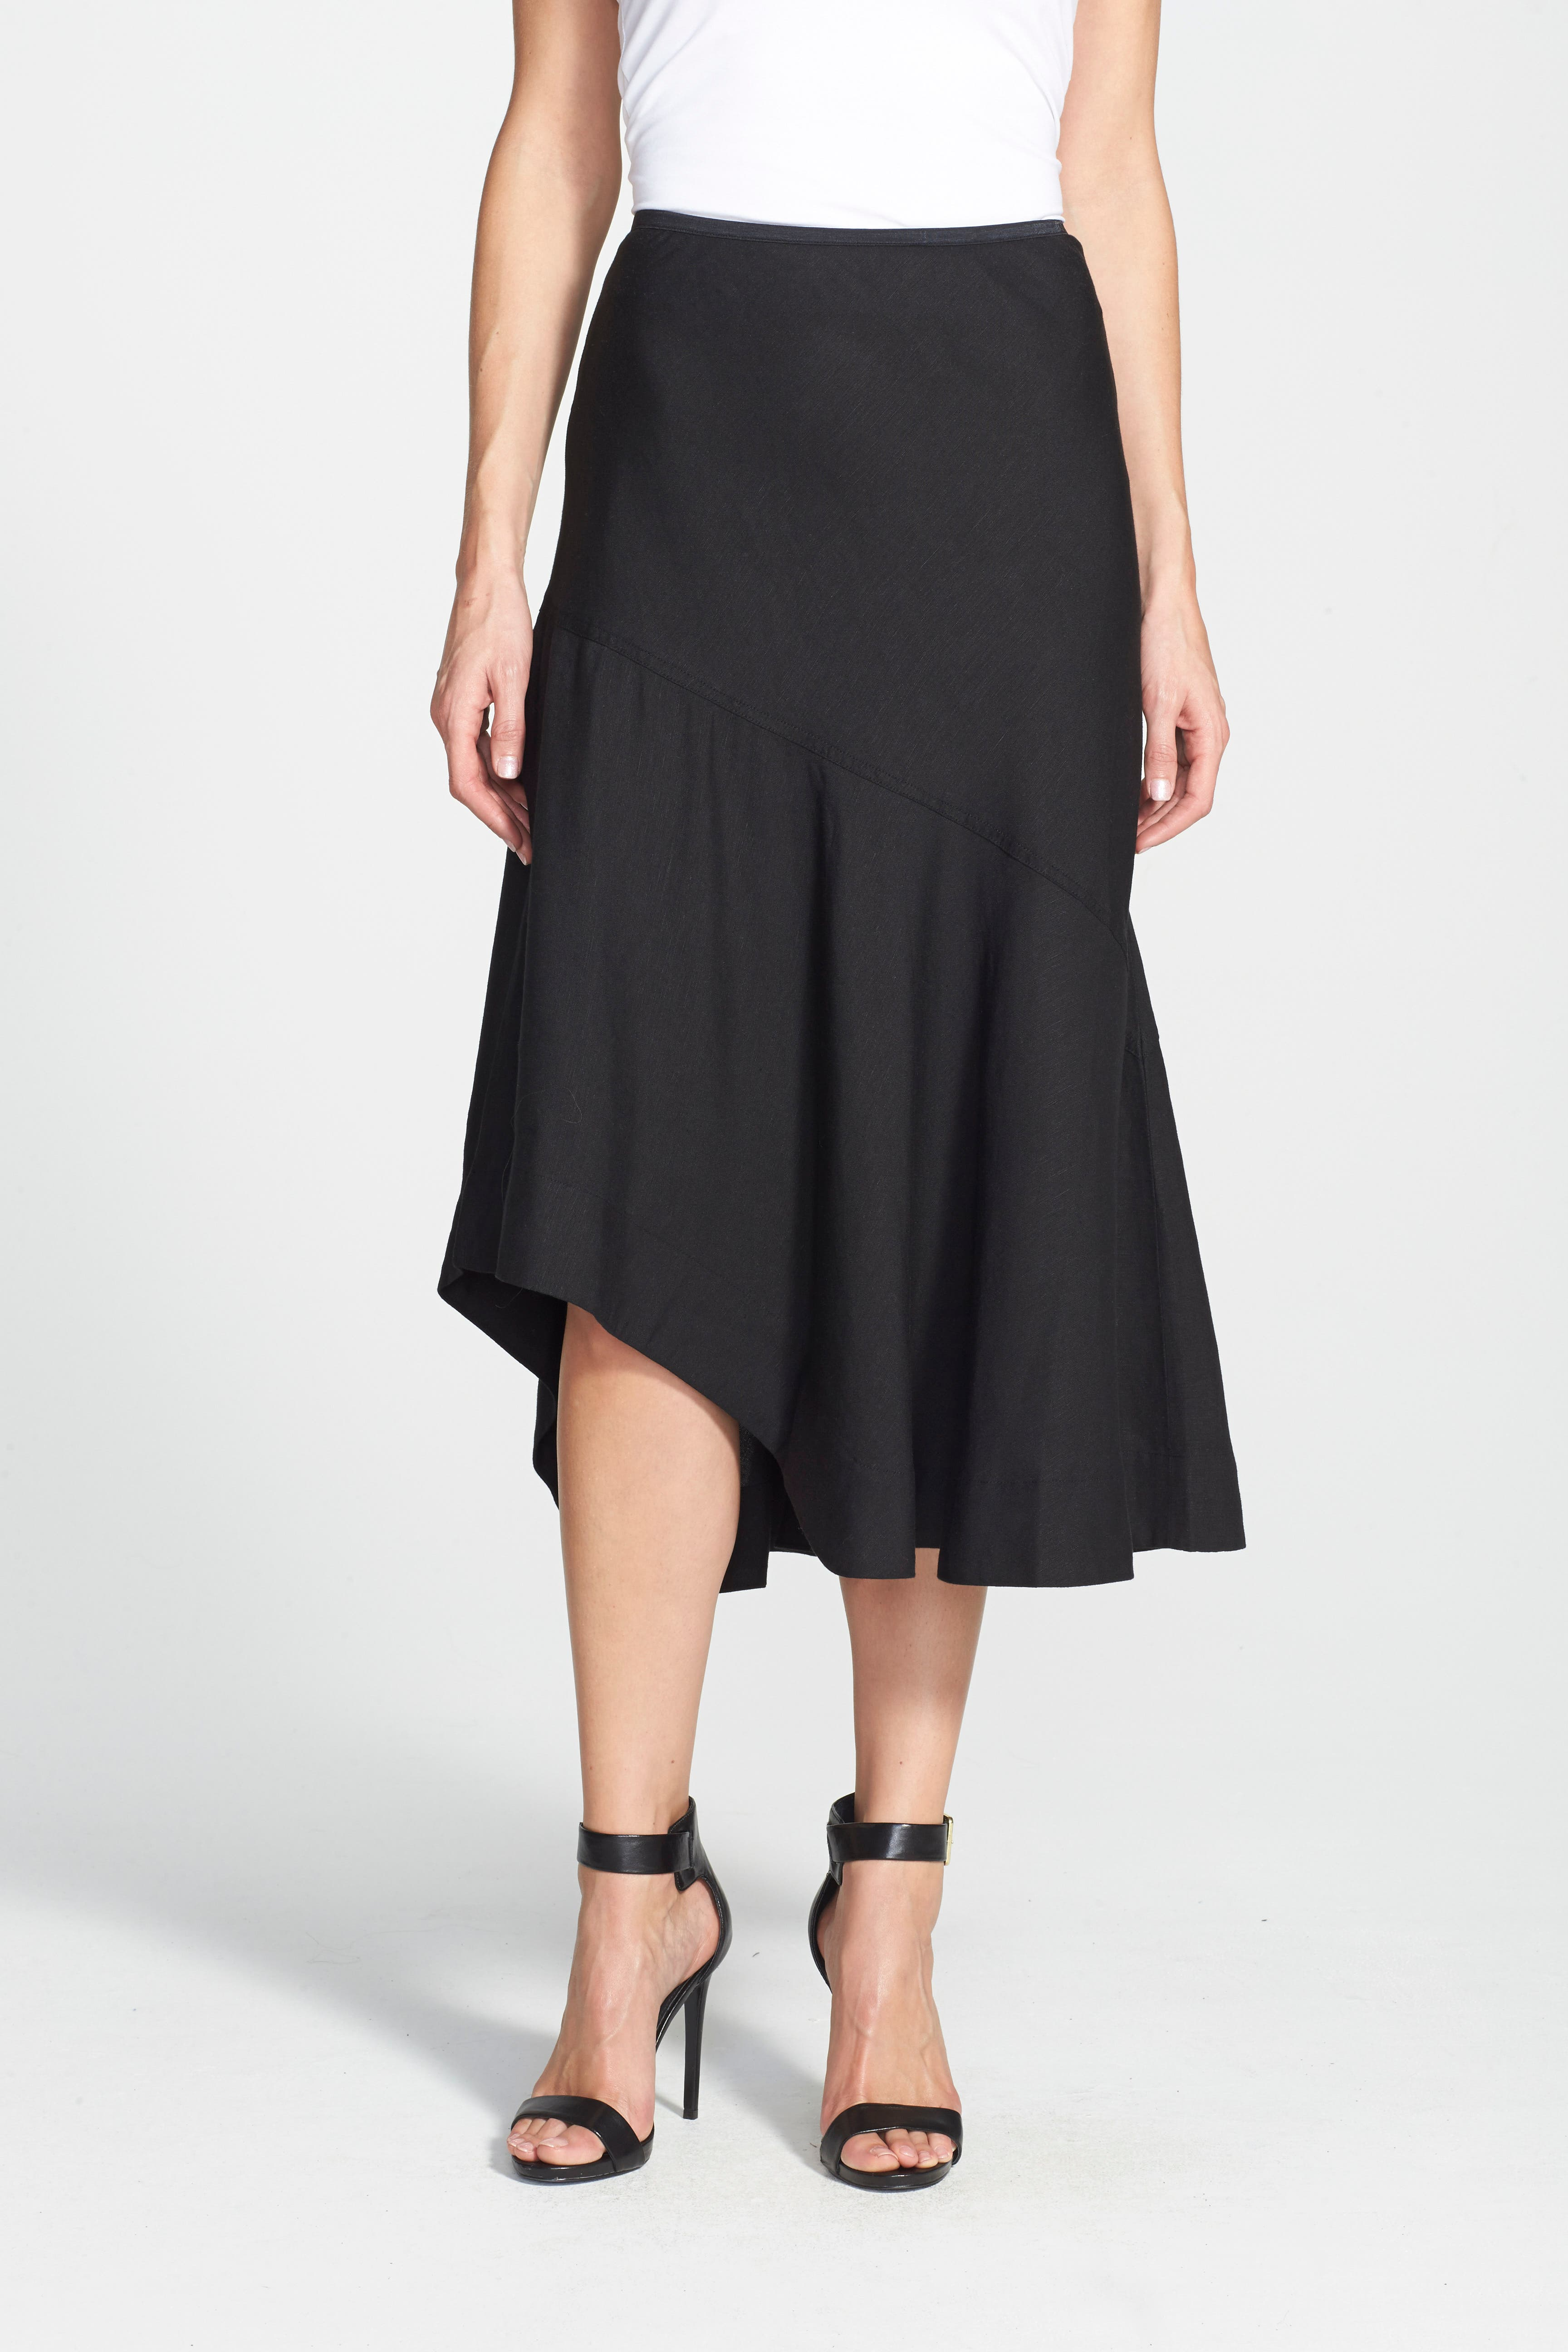 NIC+ZOE,                             'The Long Engagement' Midi Skirt,                             Alternate thumbnail 2, color,                             004